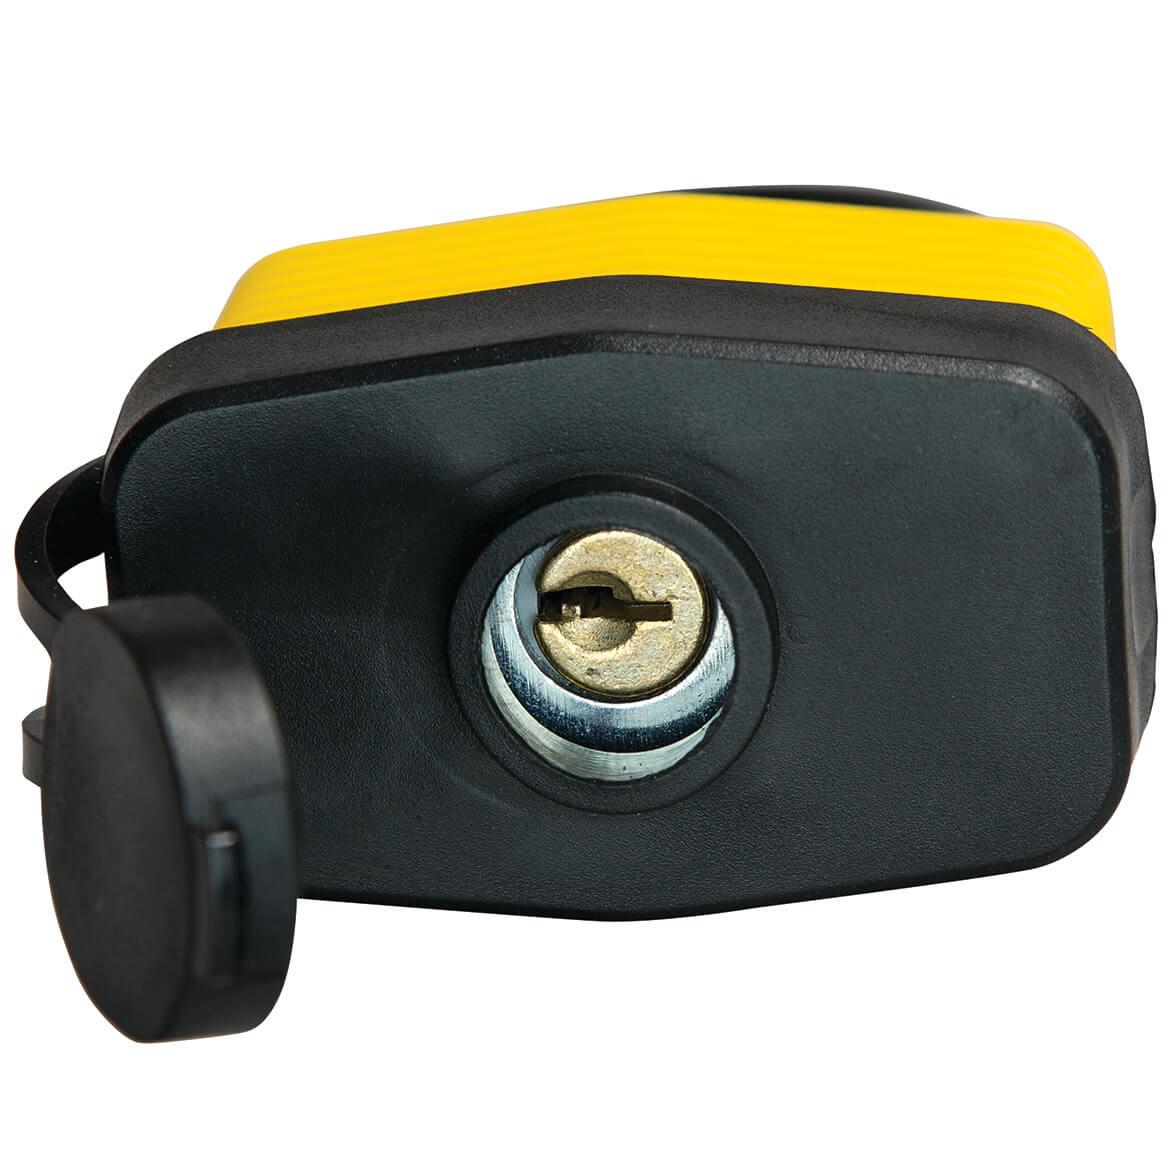 Weatherproof Lock with Three Keys-356653